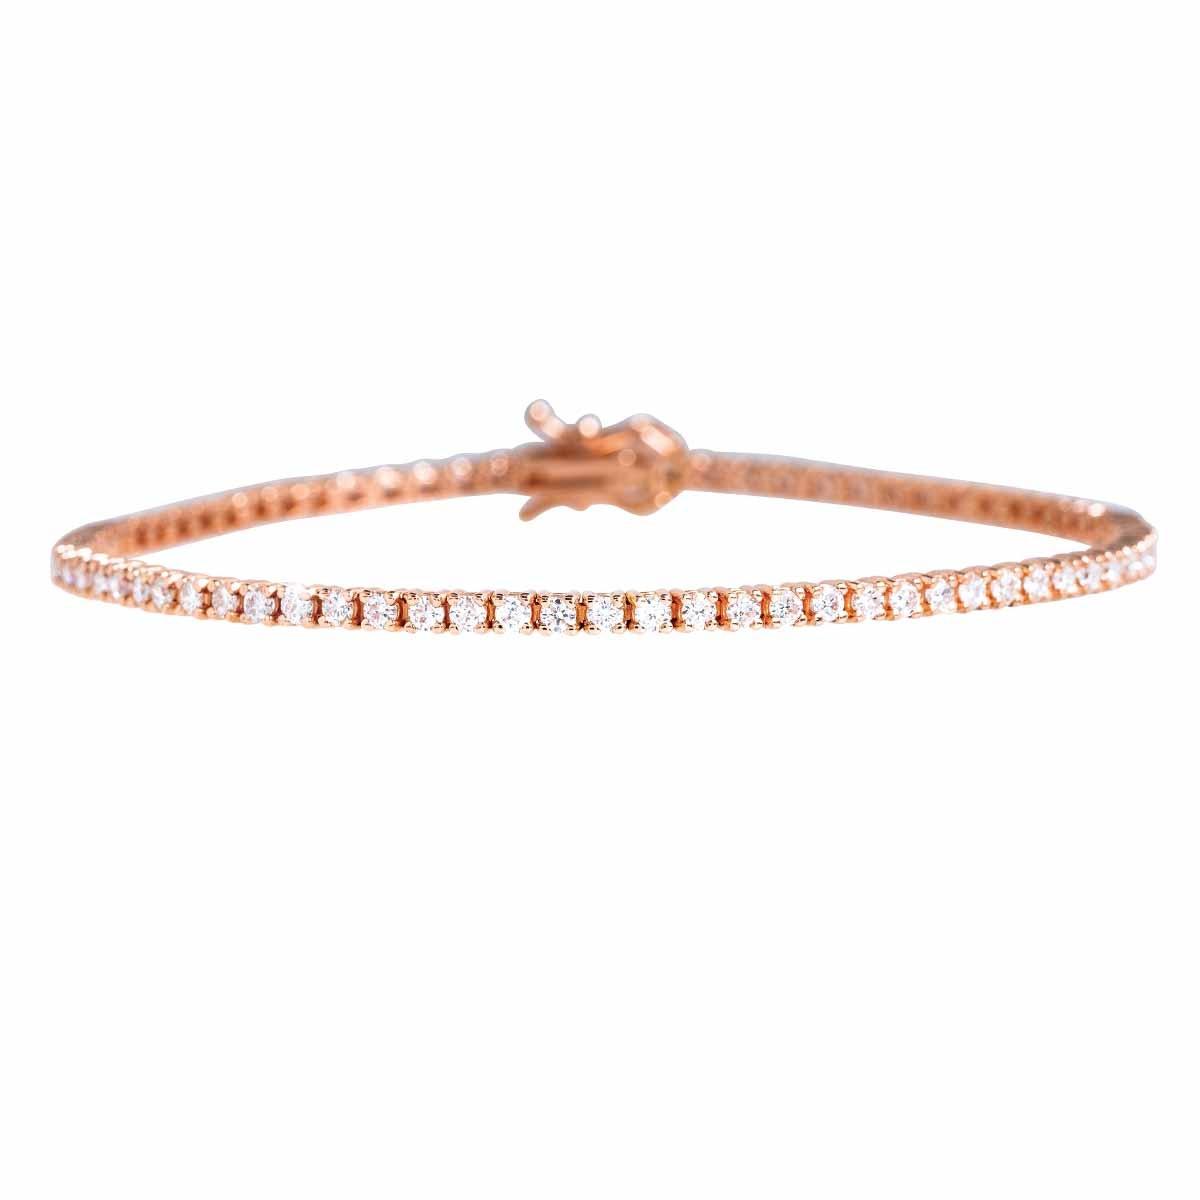 New 2.02 CTW Diamond Tennis Bracelet